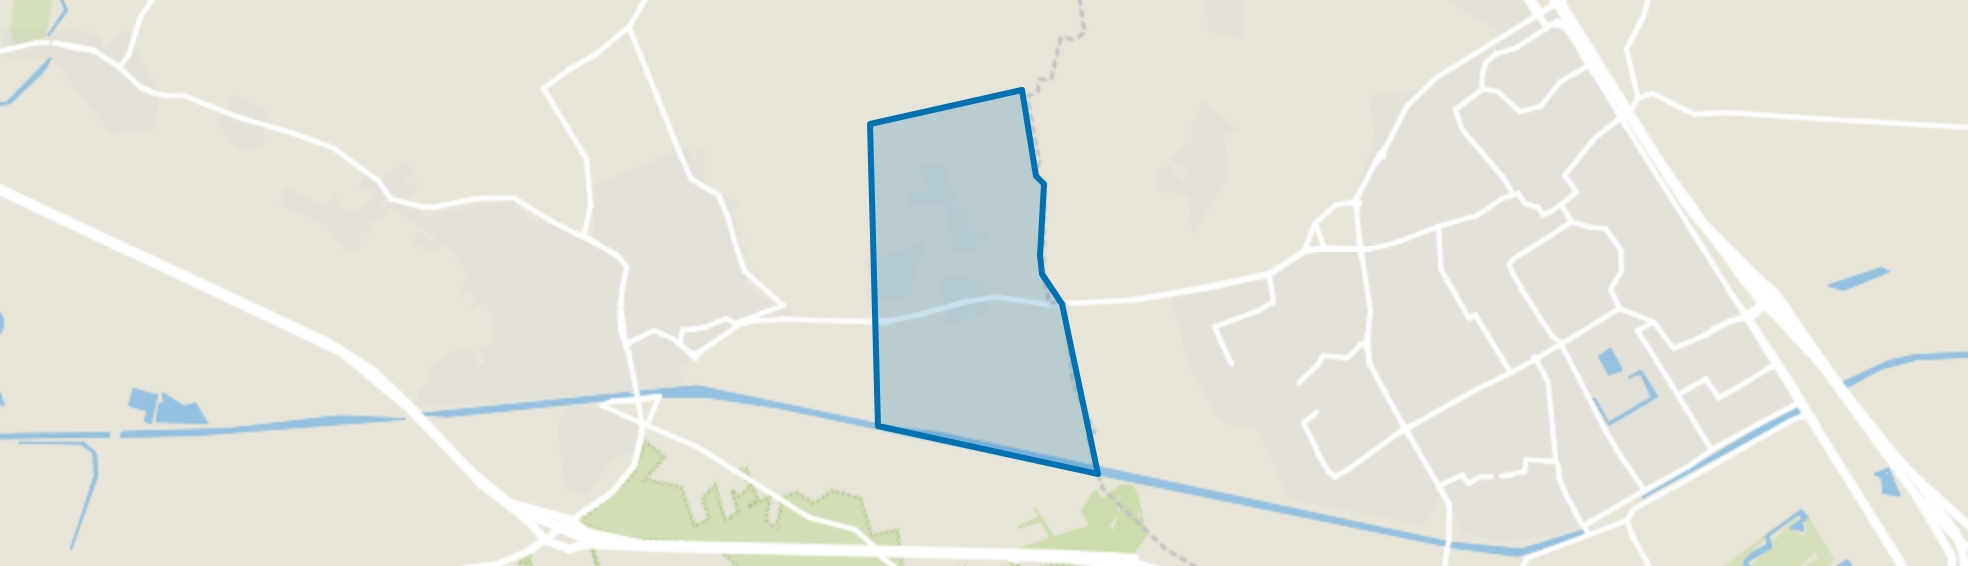 Straten met Moleneind, Oirschot map